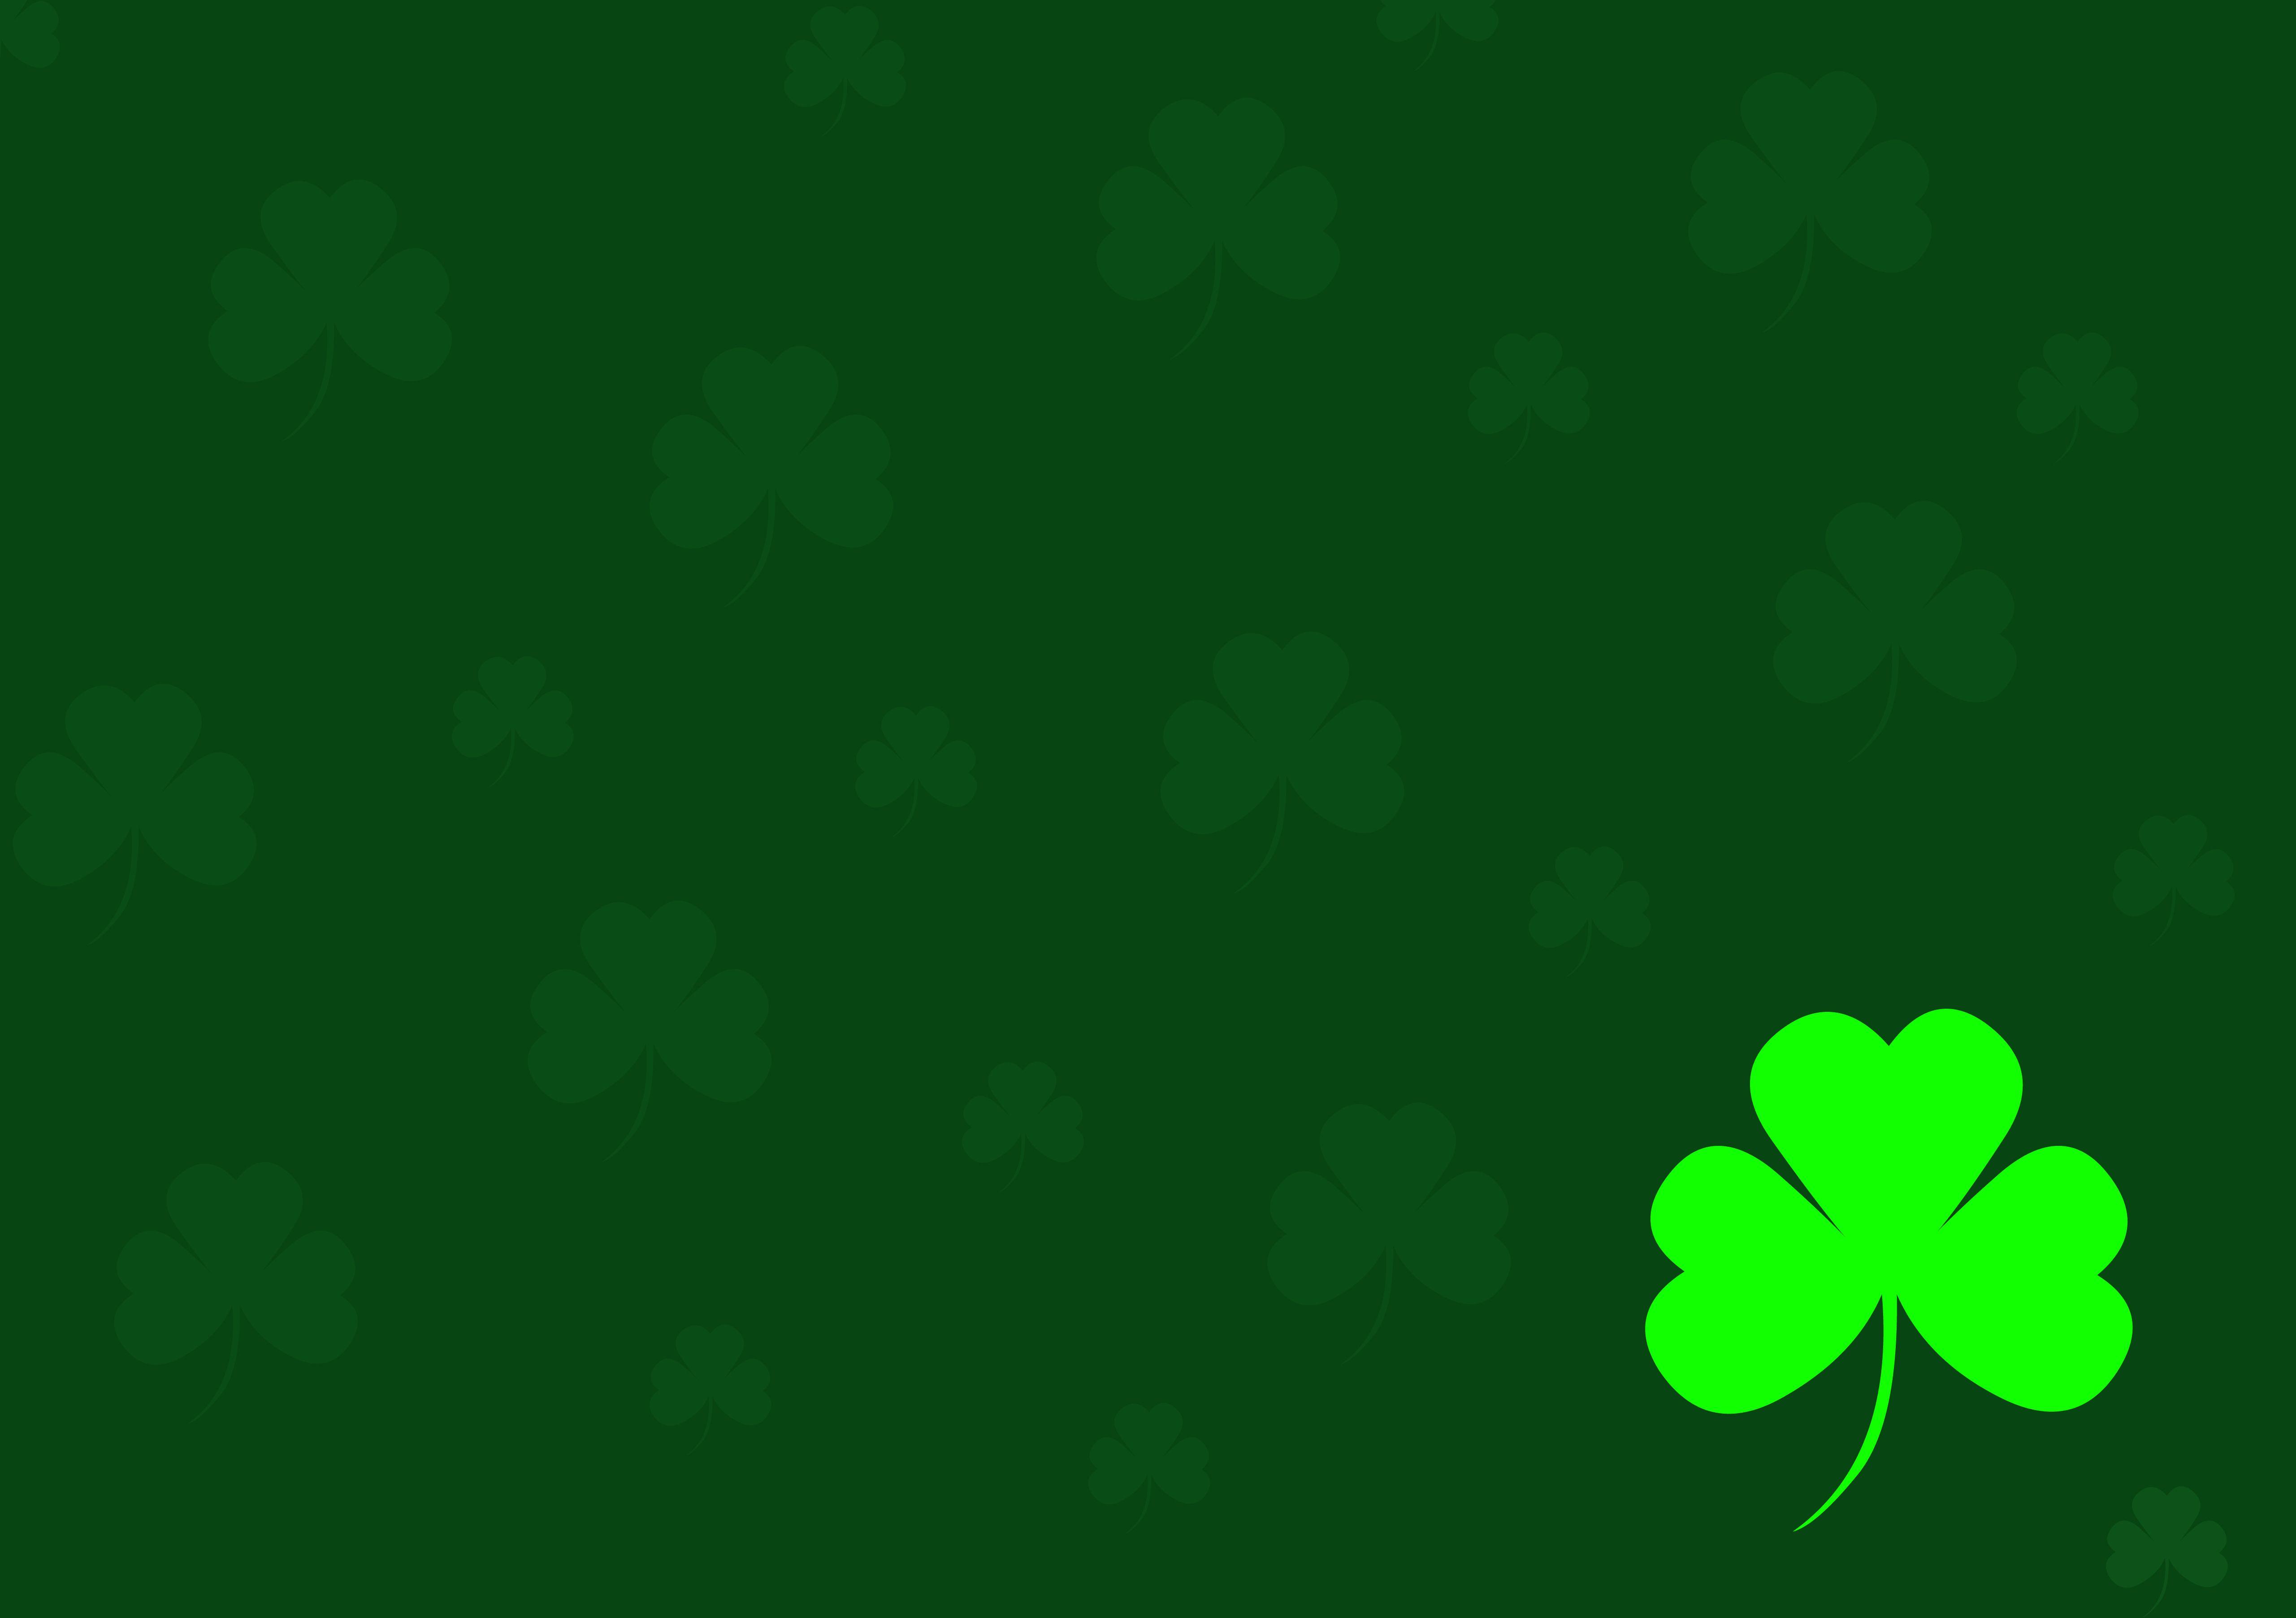 St Patricks Day Free Images Free St Patricks Day Backgrounds And Wallpaper Safa St Patricks Day Wallpaper St Patricks Day Travis Scott Iphone Wallpaper